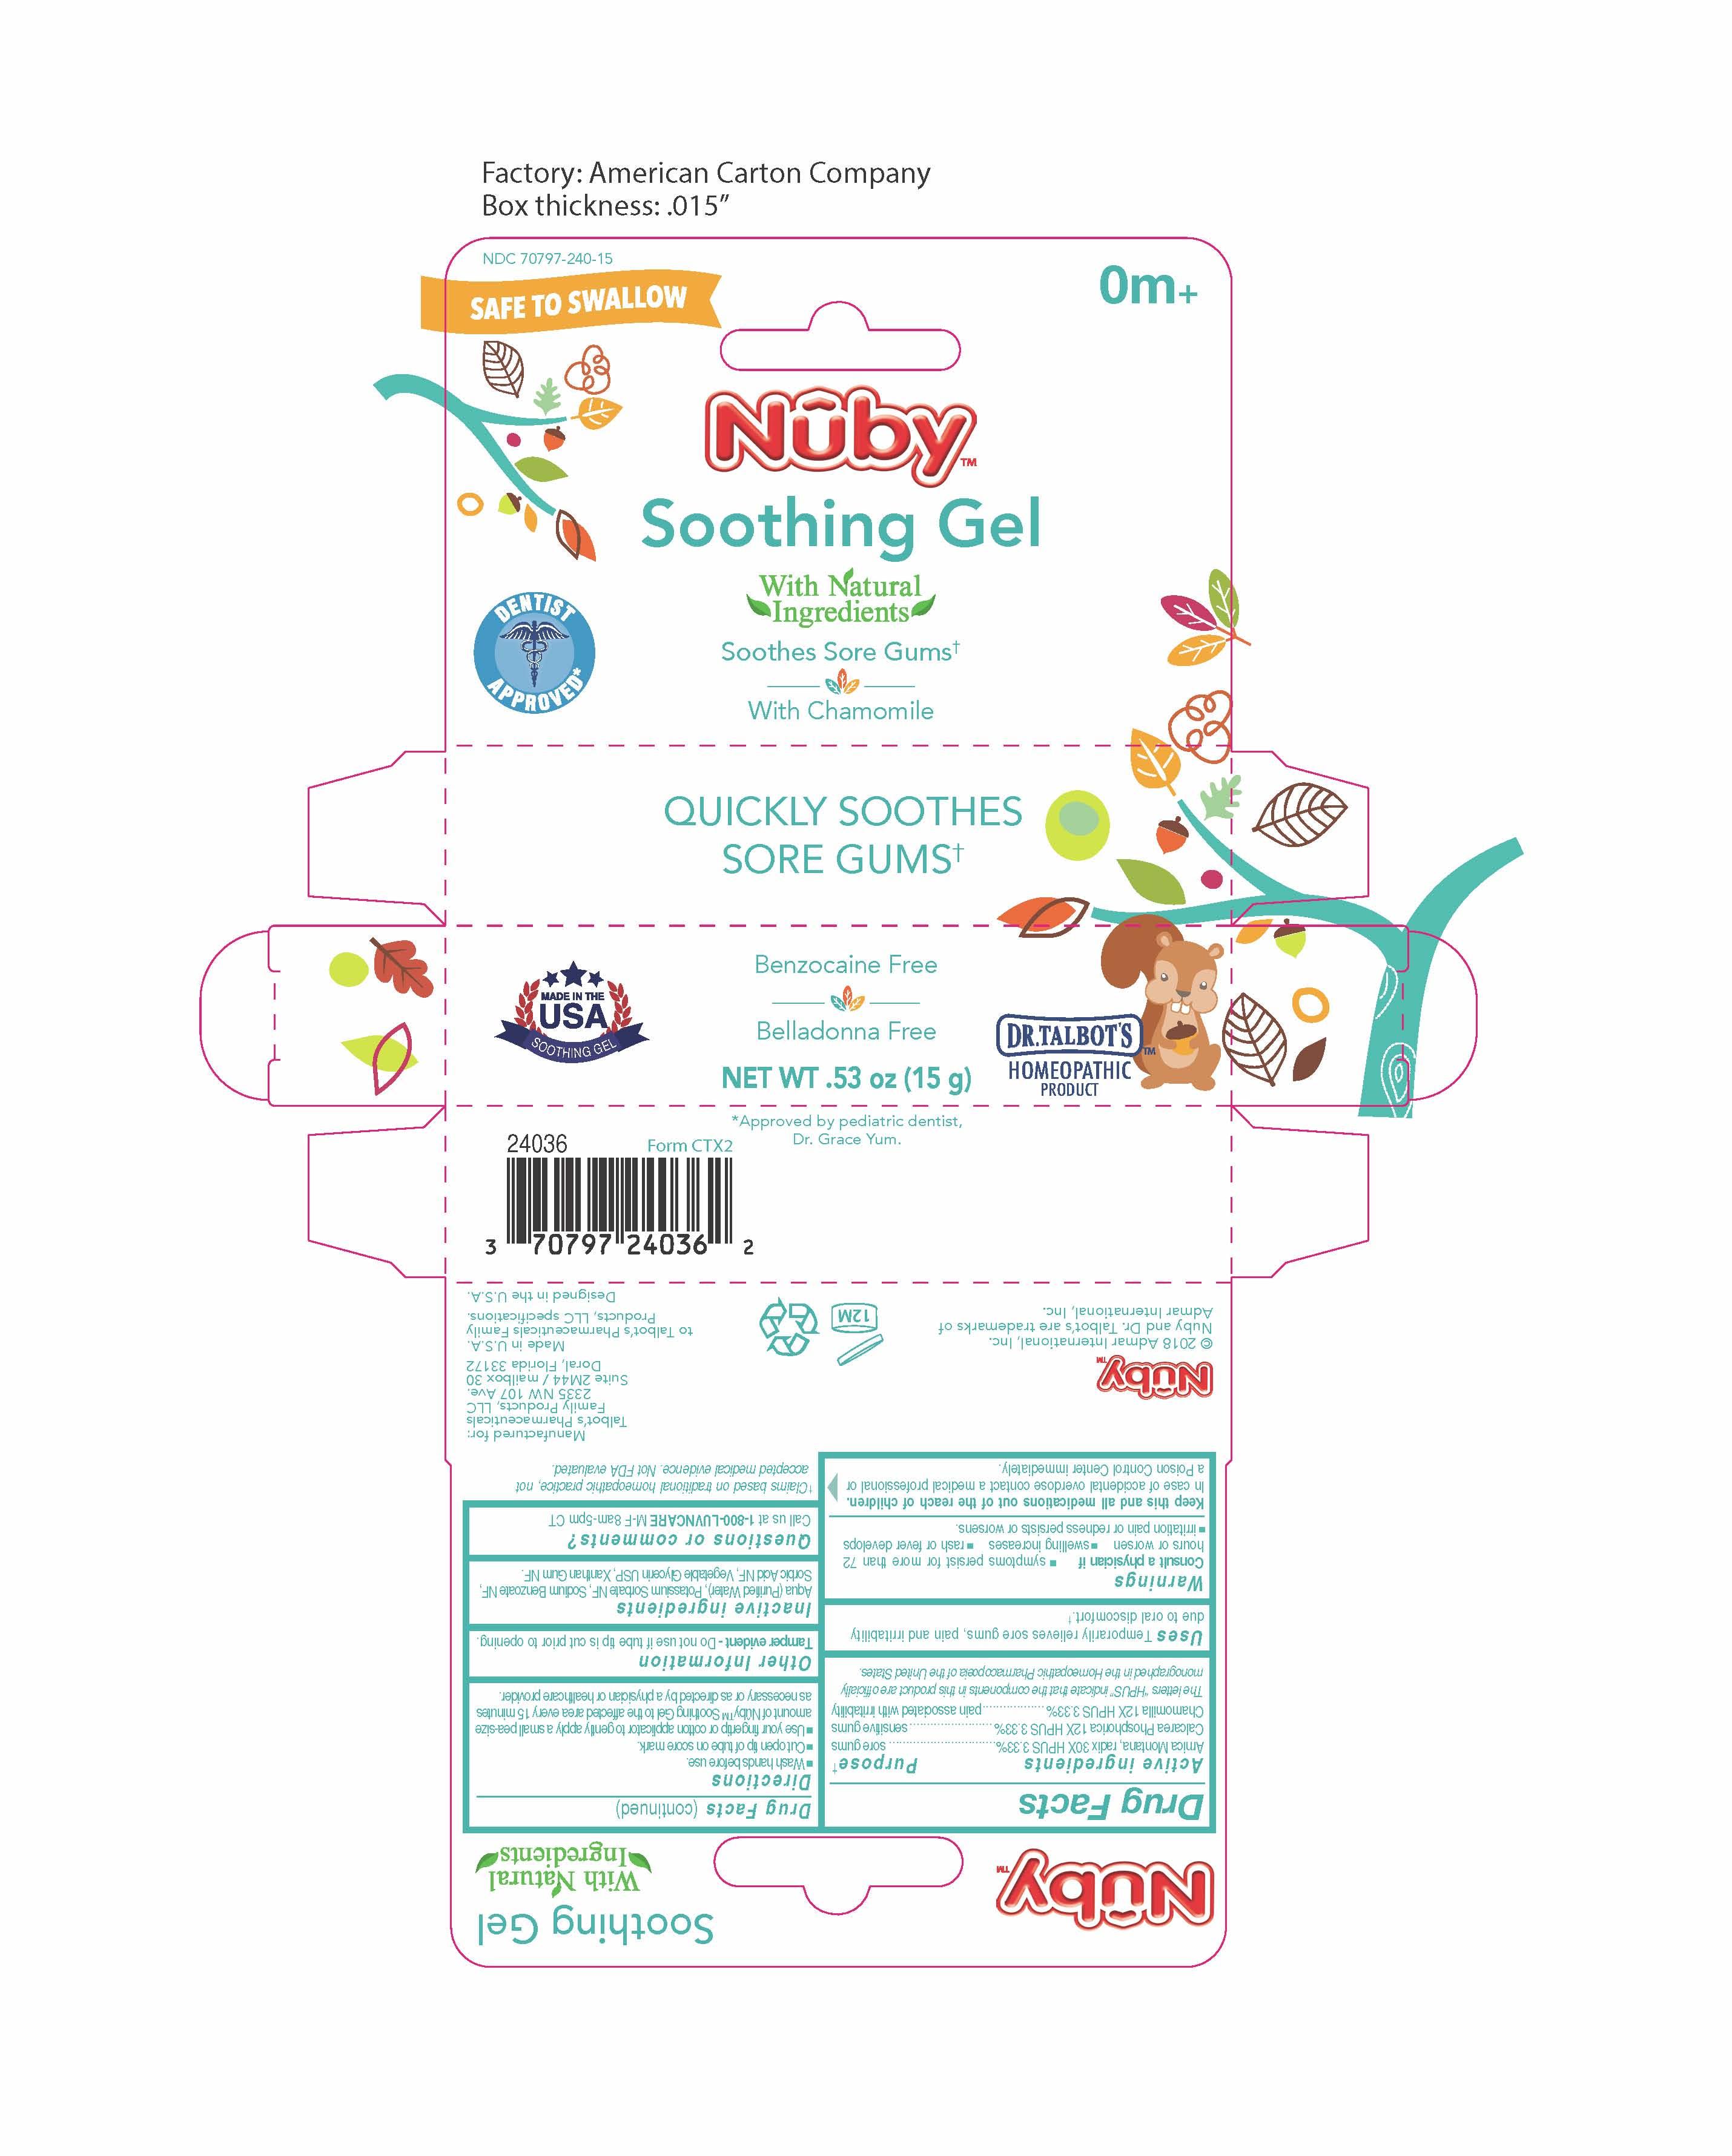 Nuby Soothing Gel   Matricaria Recutita 12 [hp_x], Arnica Montana Root 30 [hp_x], Calcium Cation 12 [hp_x] while Breastfeeding